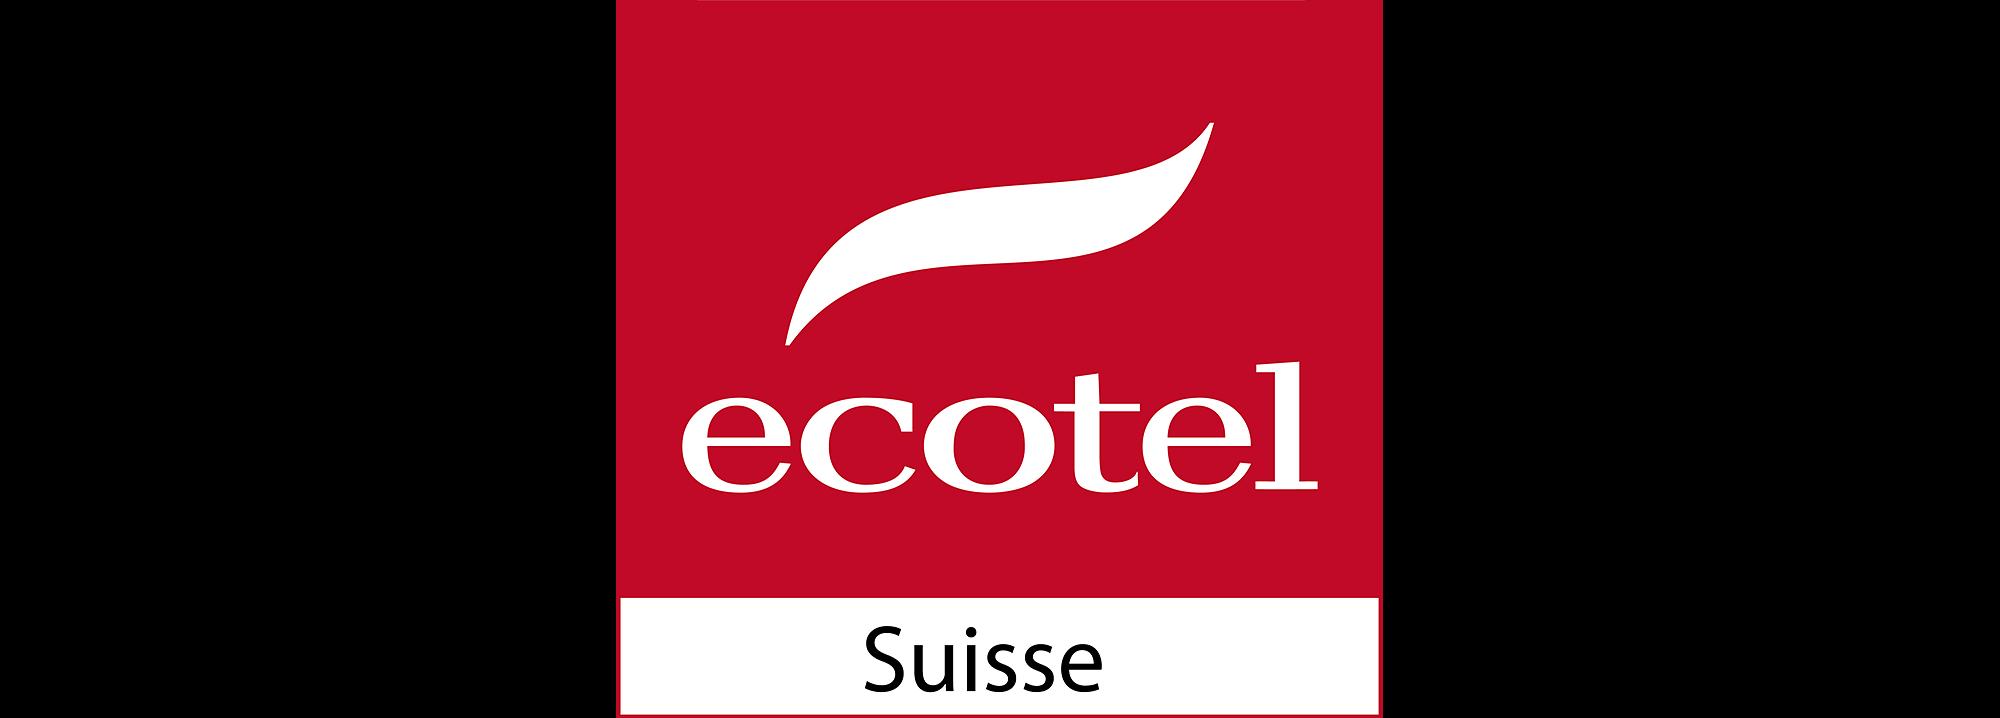 ECOTEL SUISSE SA